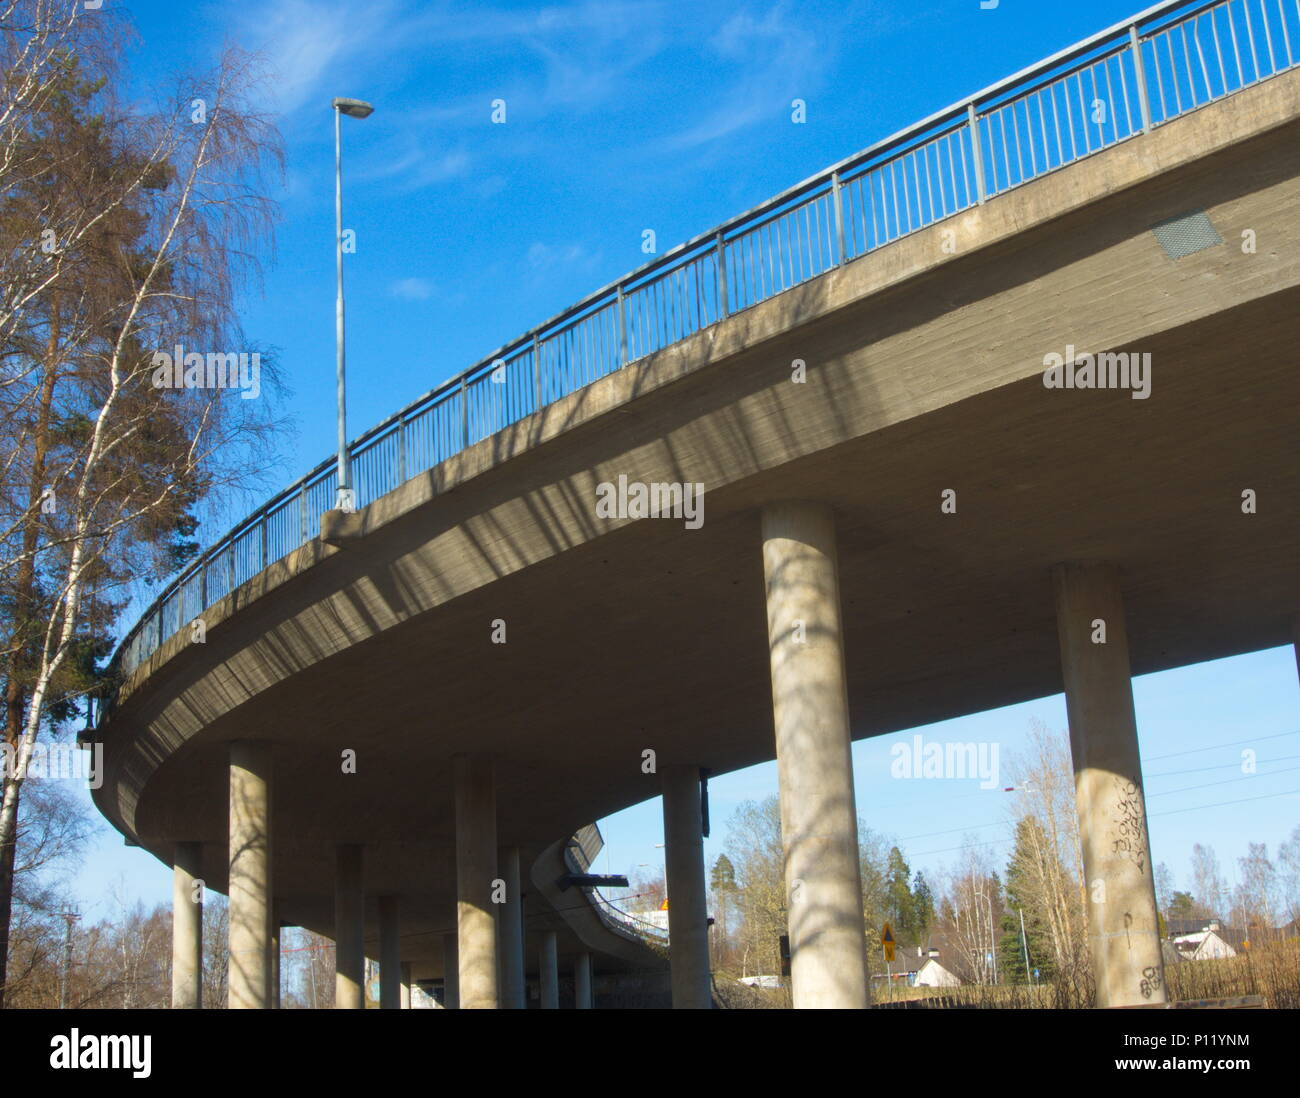 Concrete road bridge and a blue sky - Stock Image